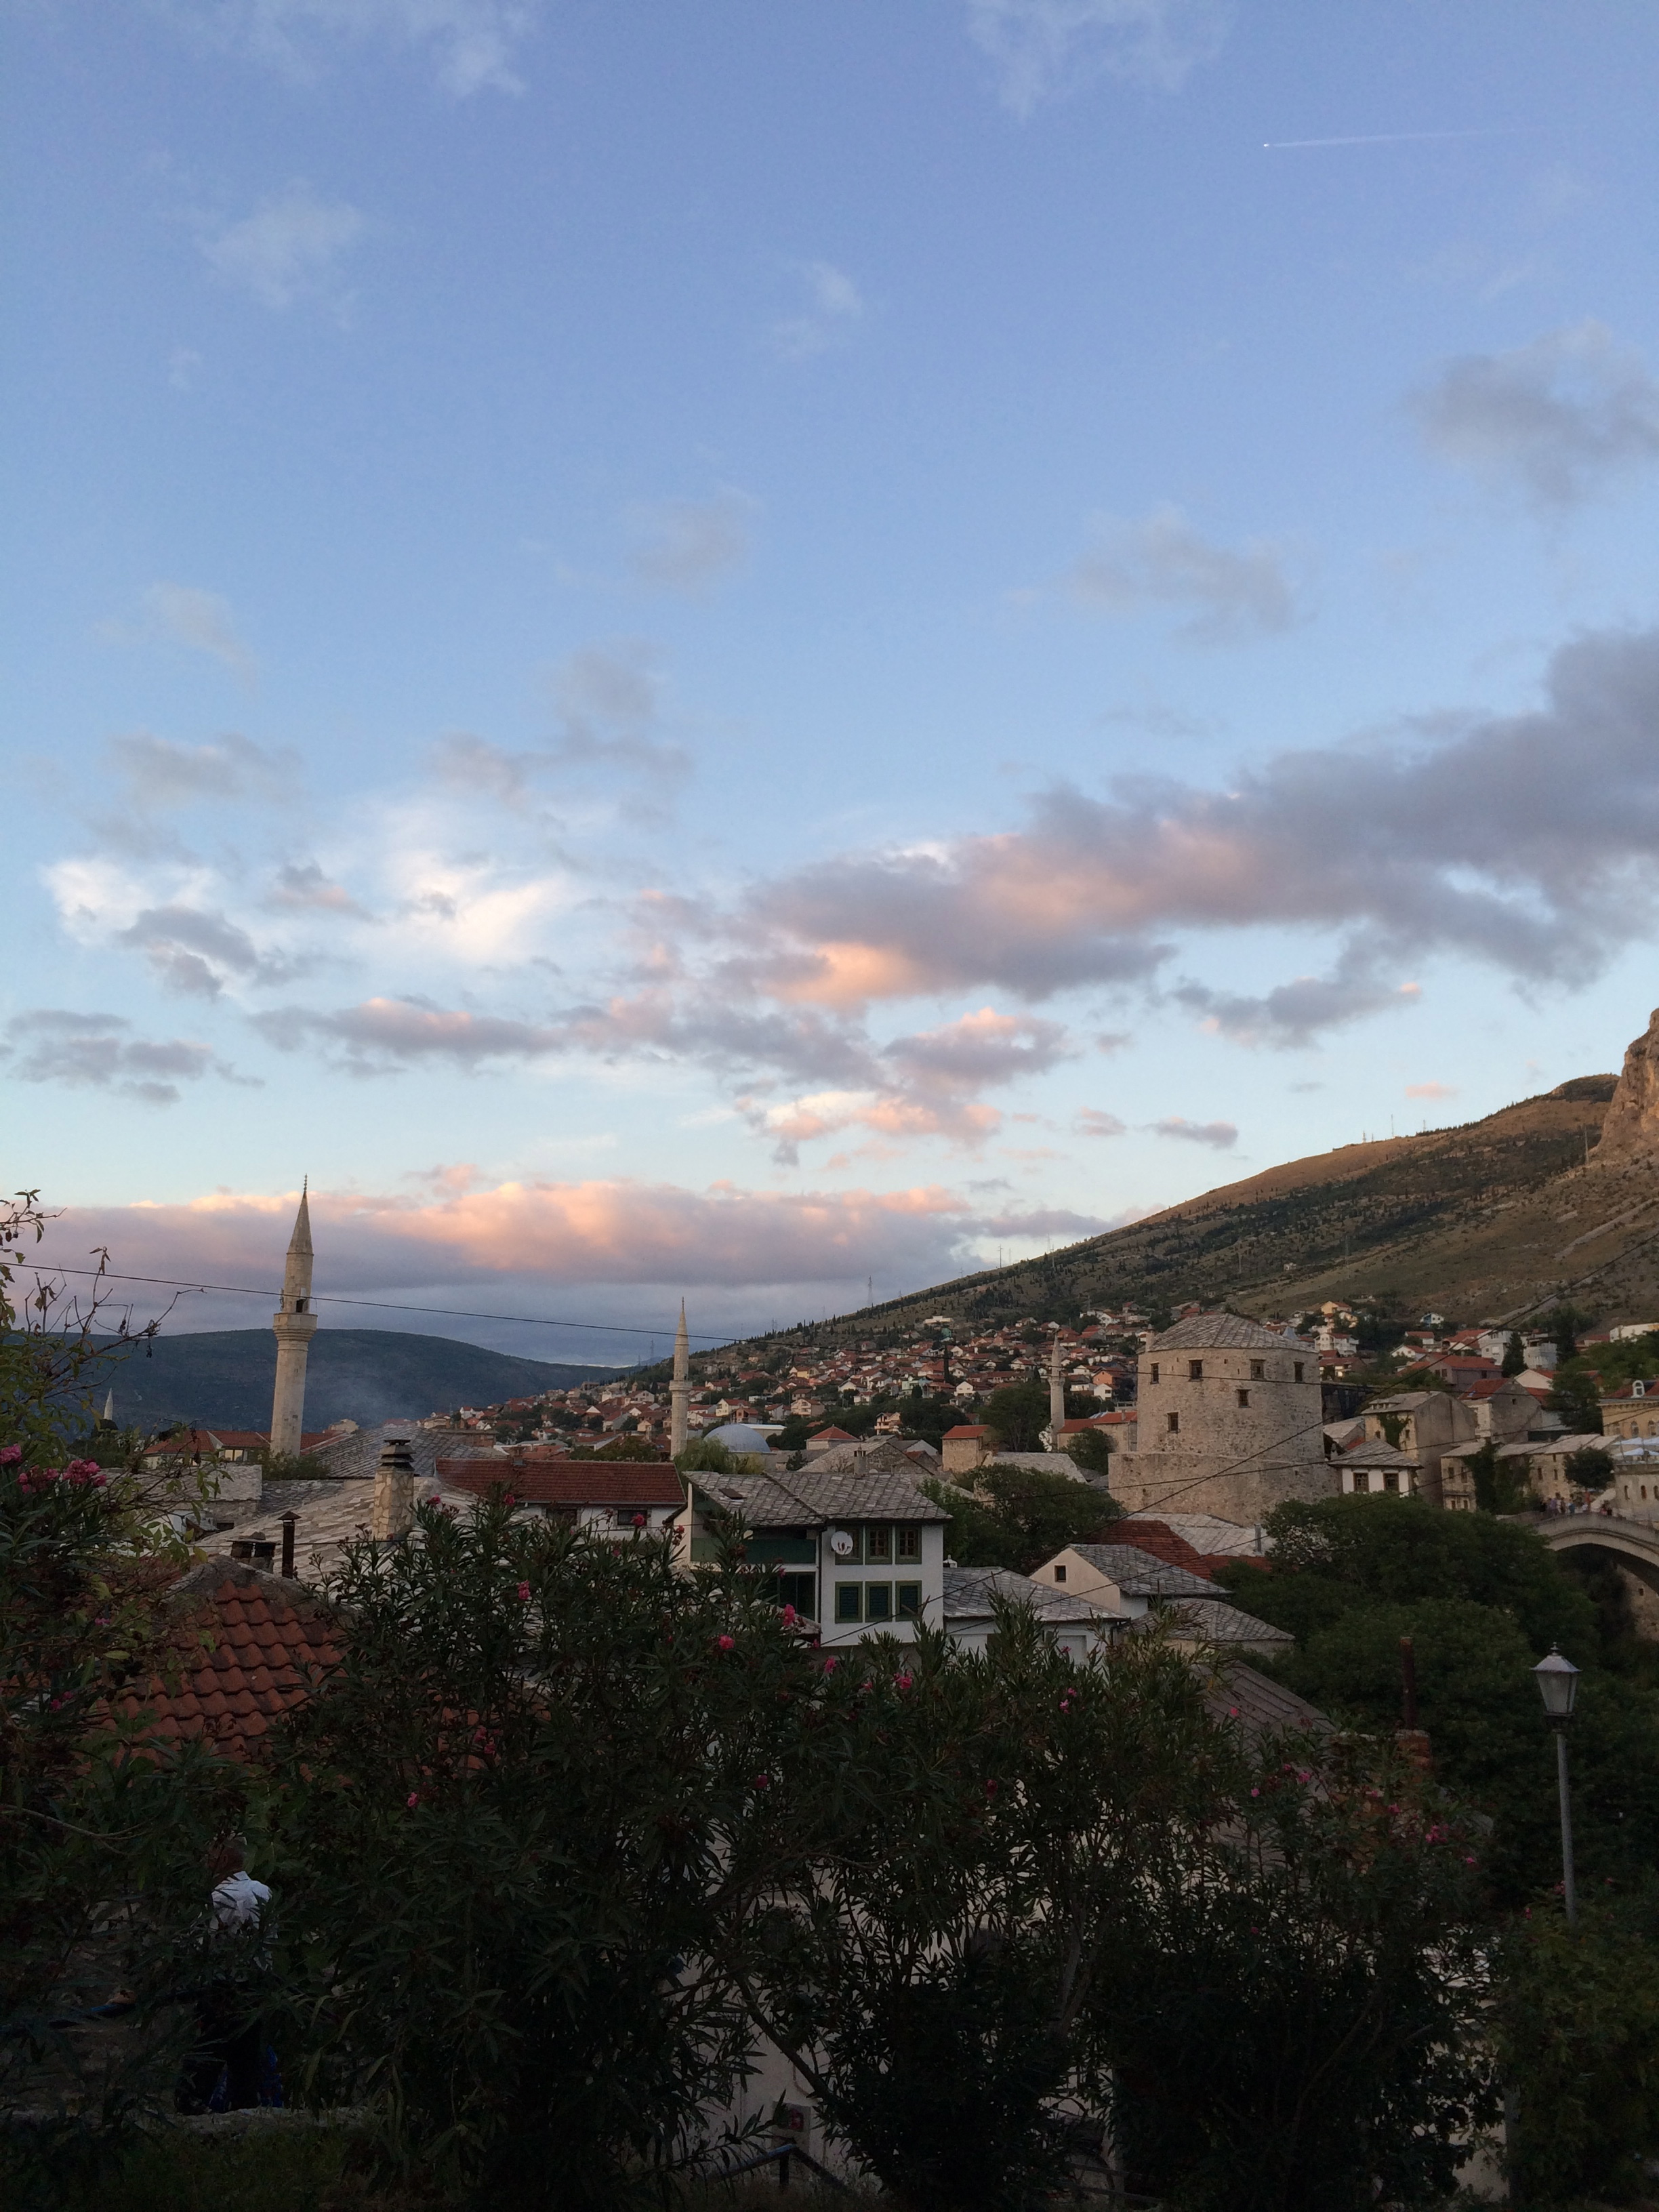 Sunset over Mostar, Bosnia - cultivatedrambler.com